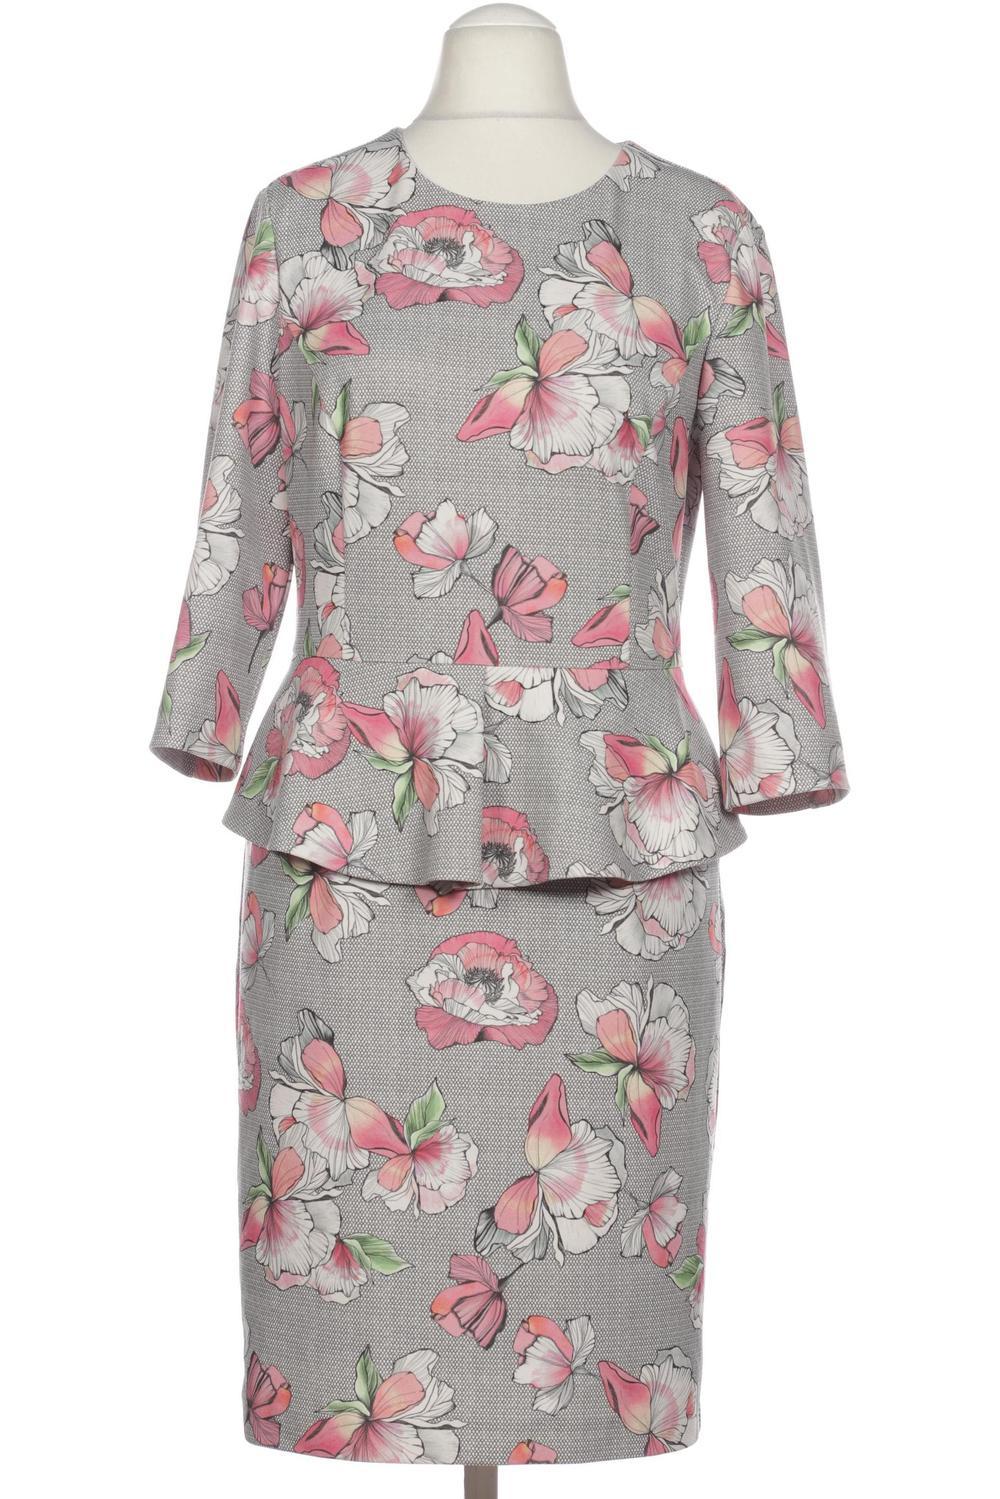 details zu betty barclay kleid damen dress damenkleid gr. de 38 kein  etikett grau #0c26837